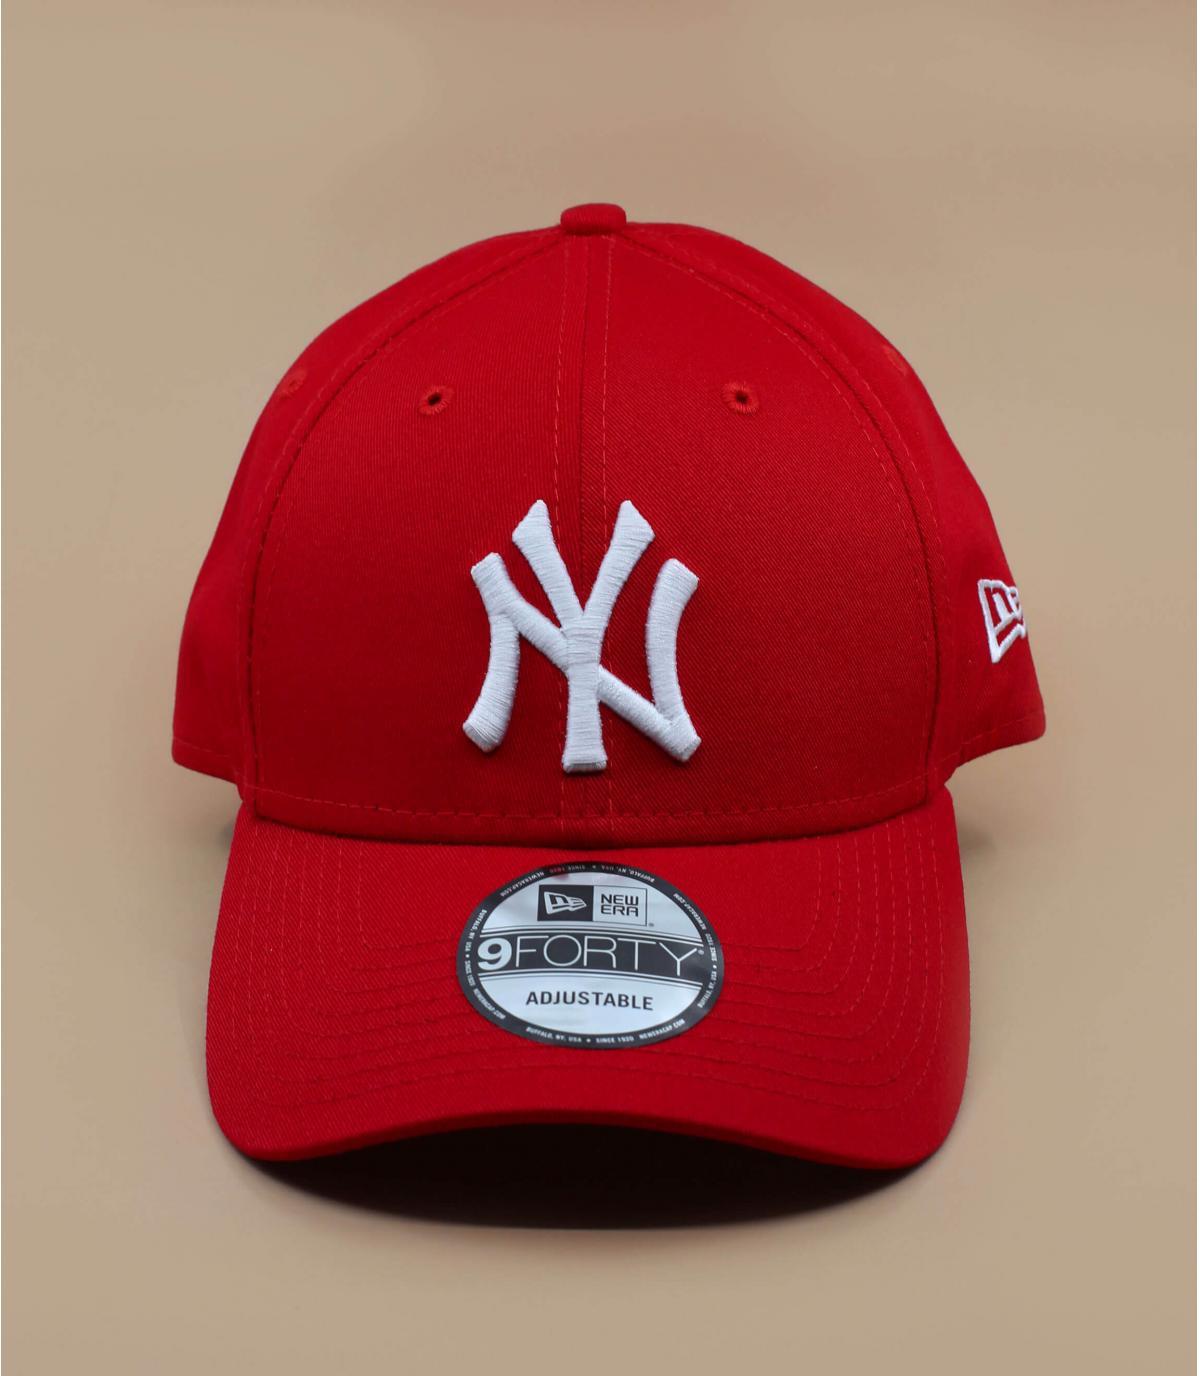 Adjustable red cap